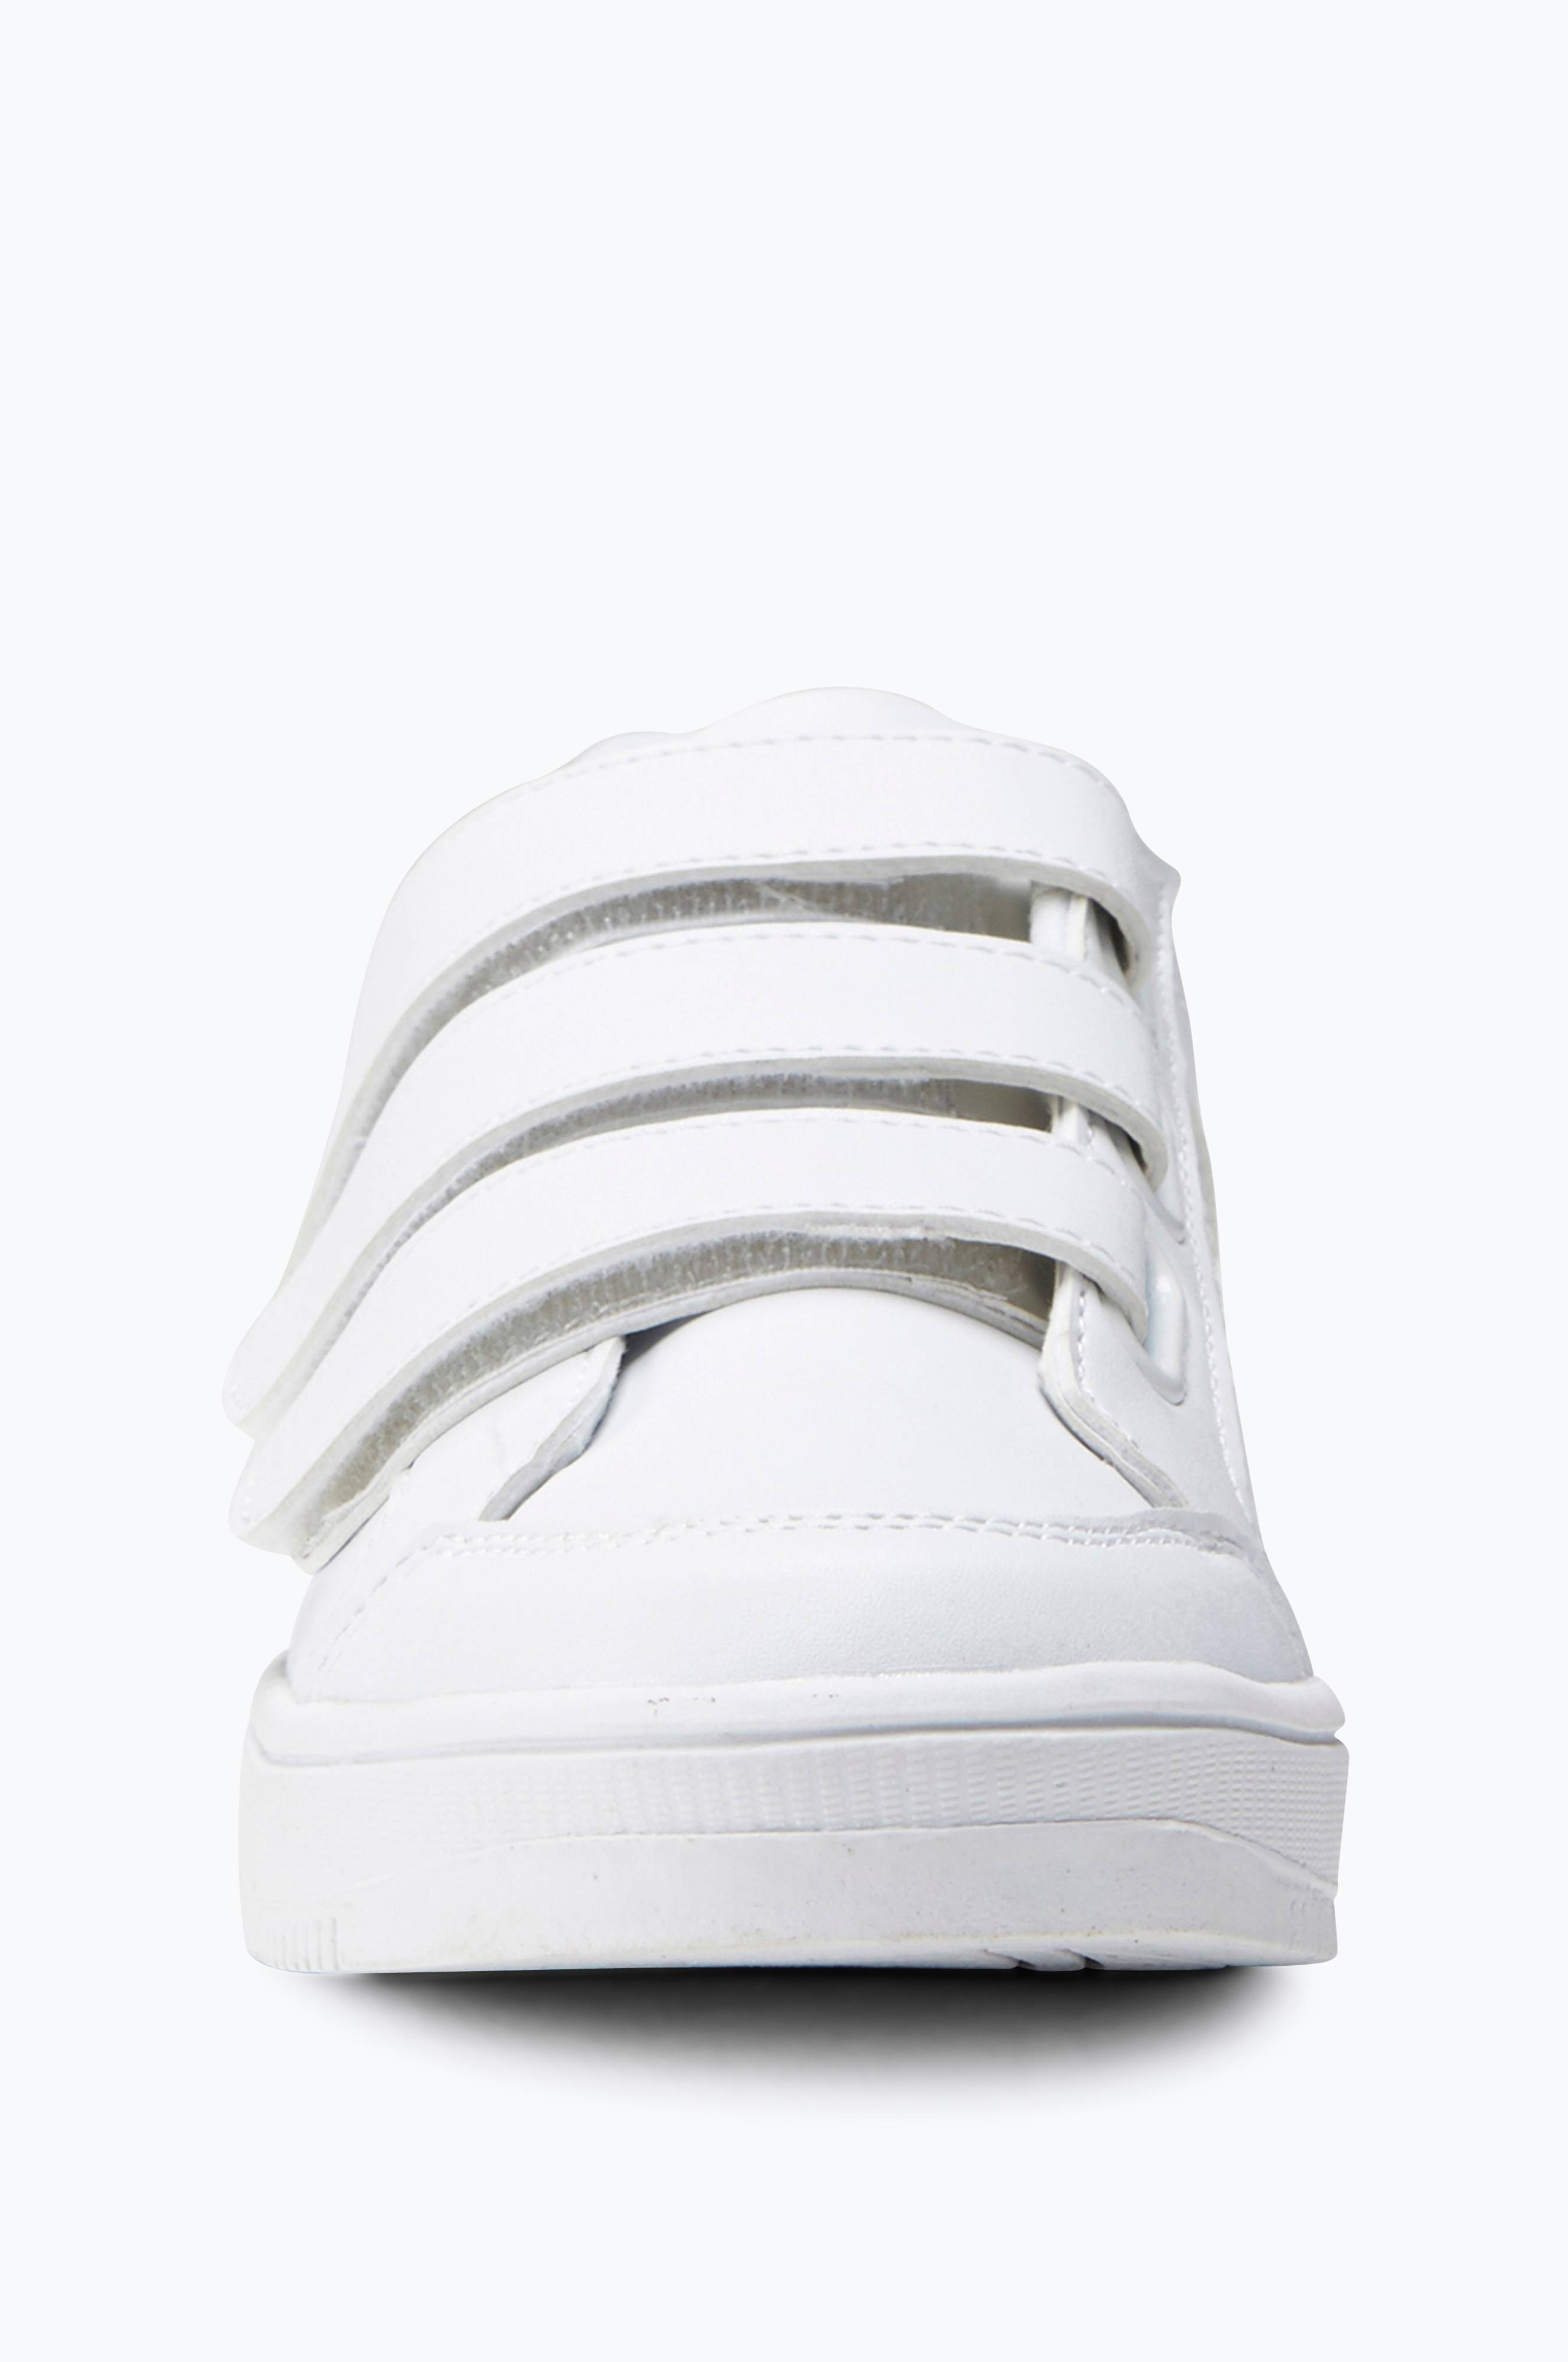 Ellos Shoes Sneakers med kardborre Vit Barn Ellos.se